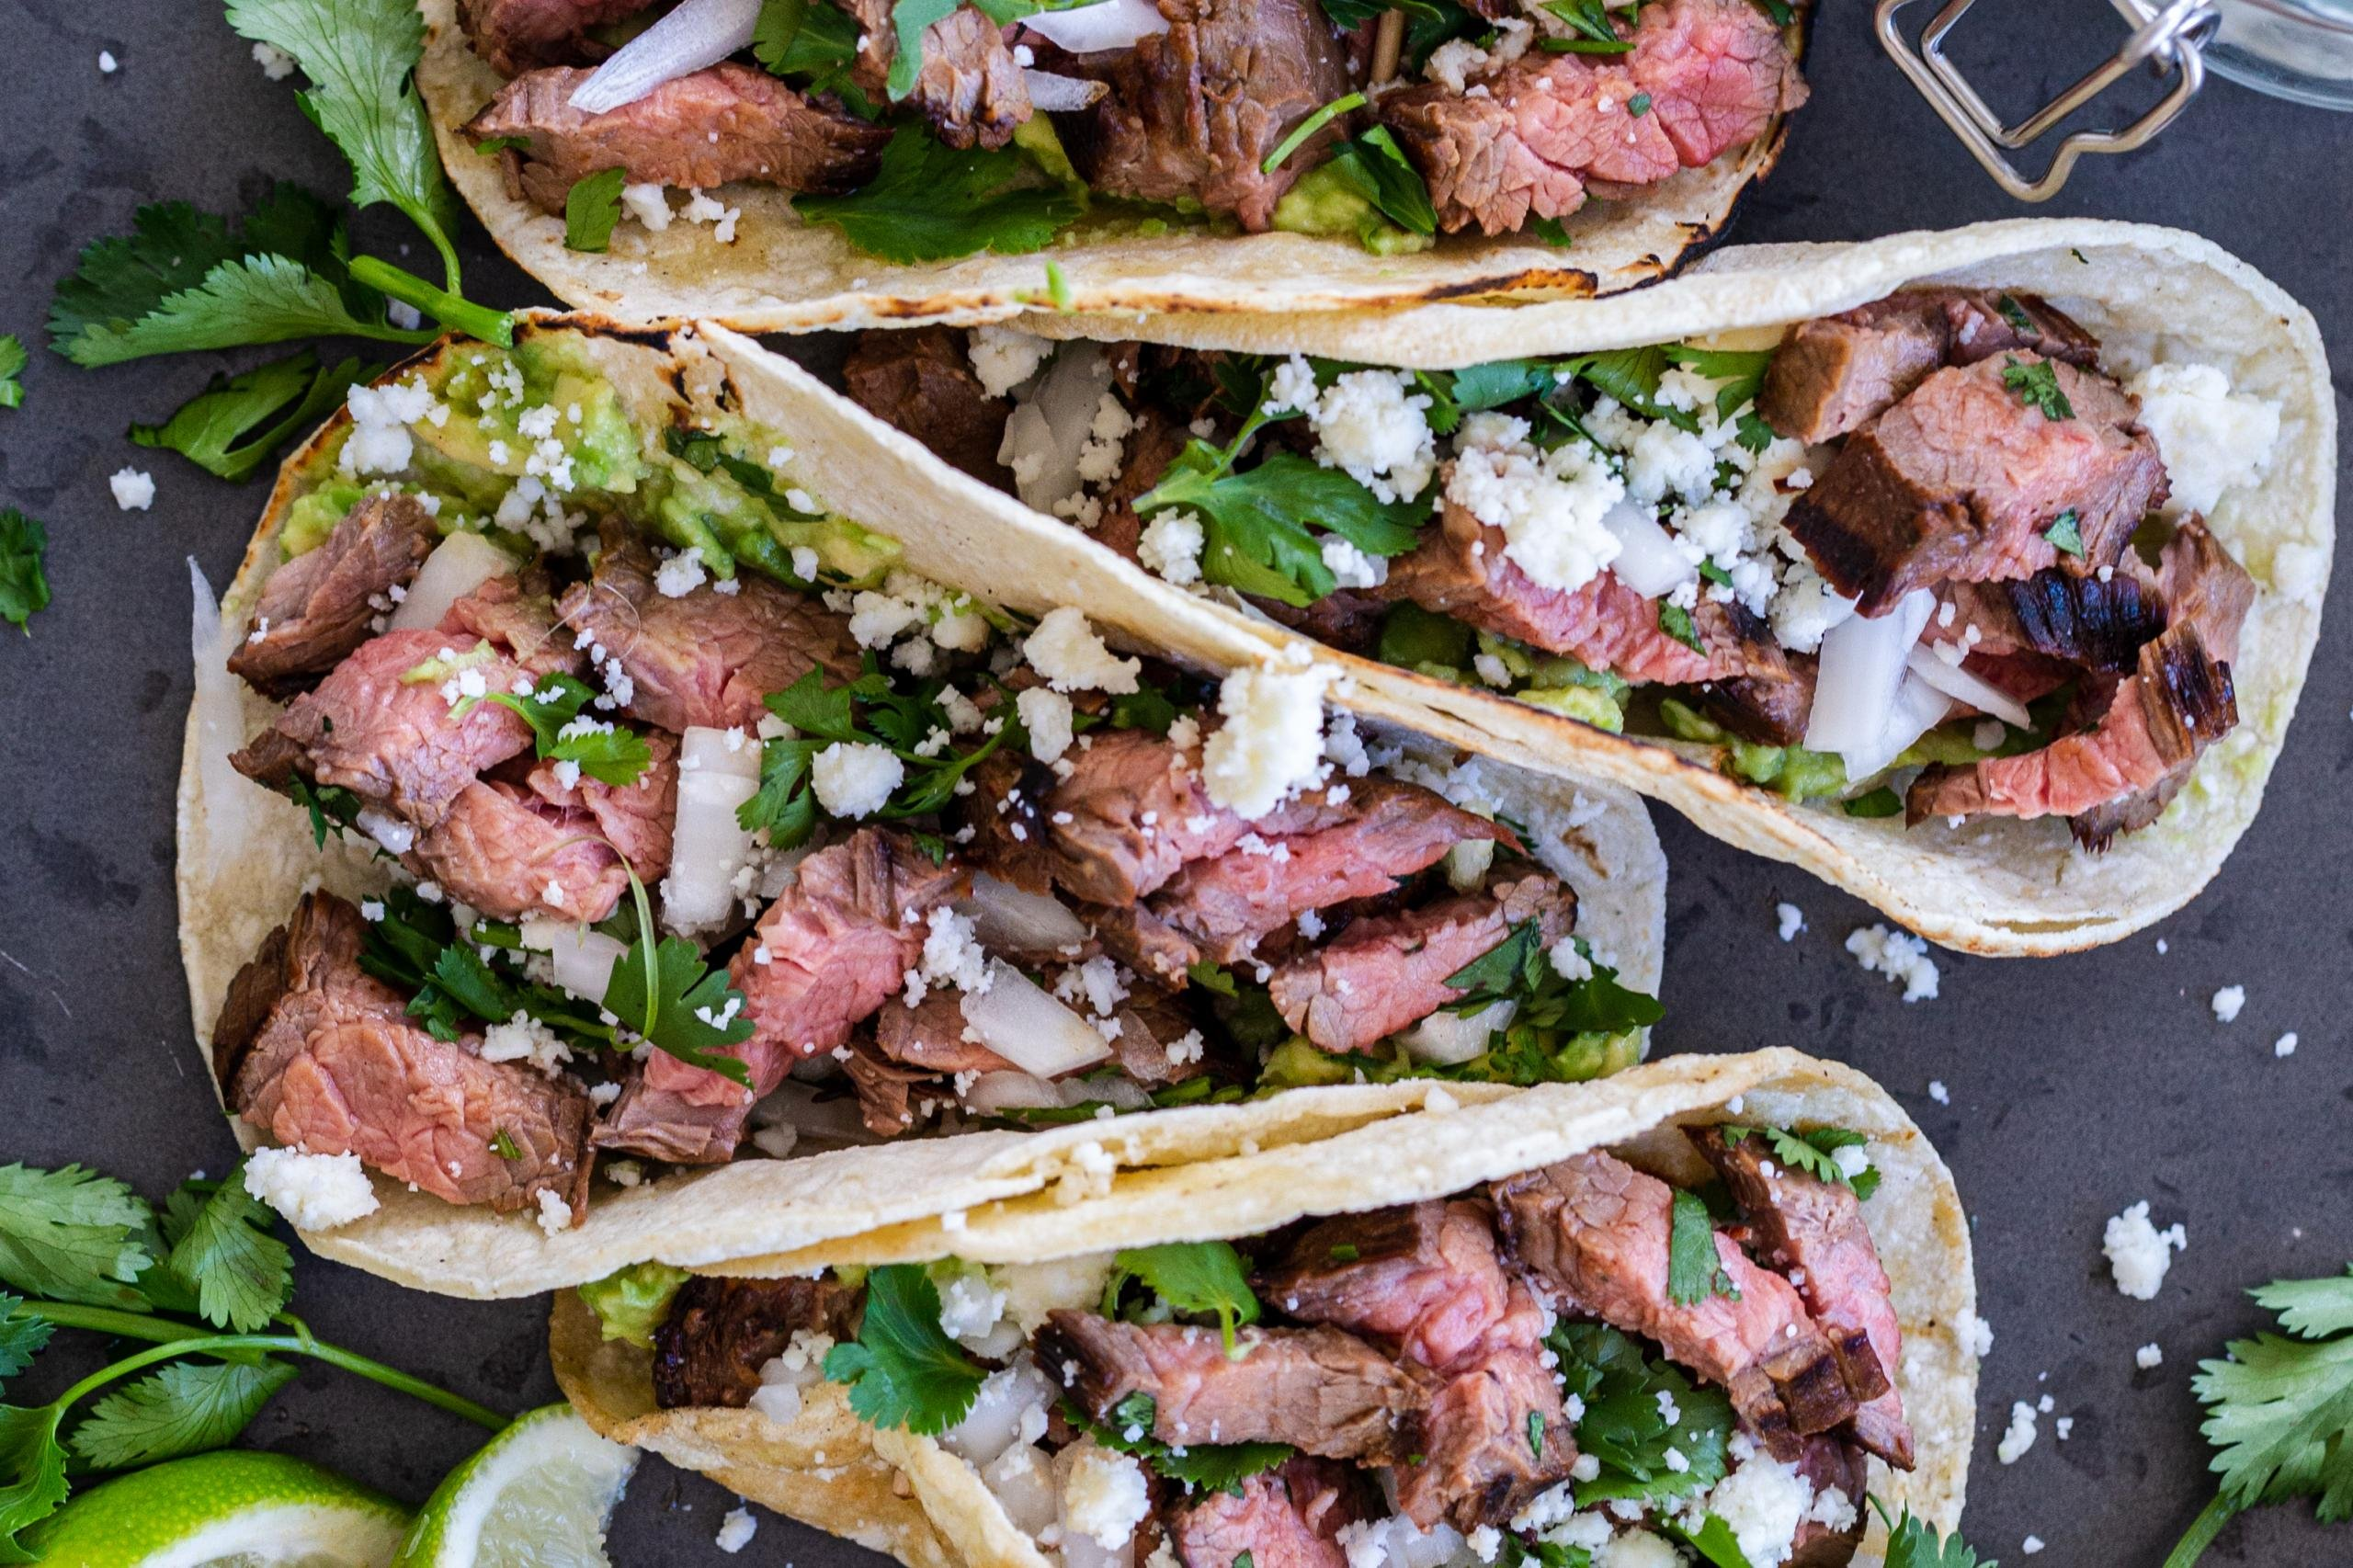 Authentic Carne Asada Street Taco Recipe